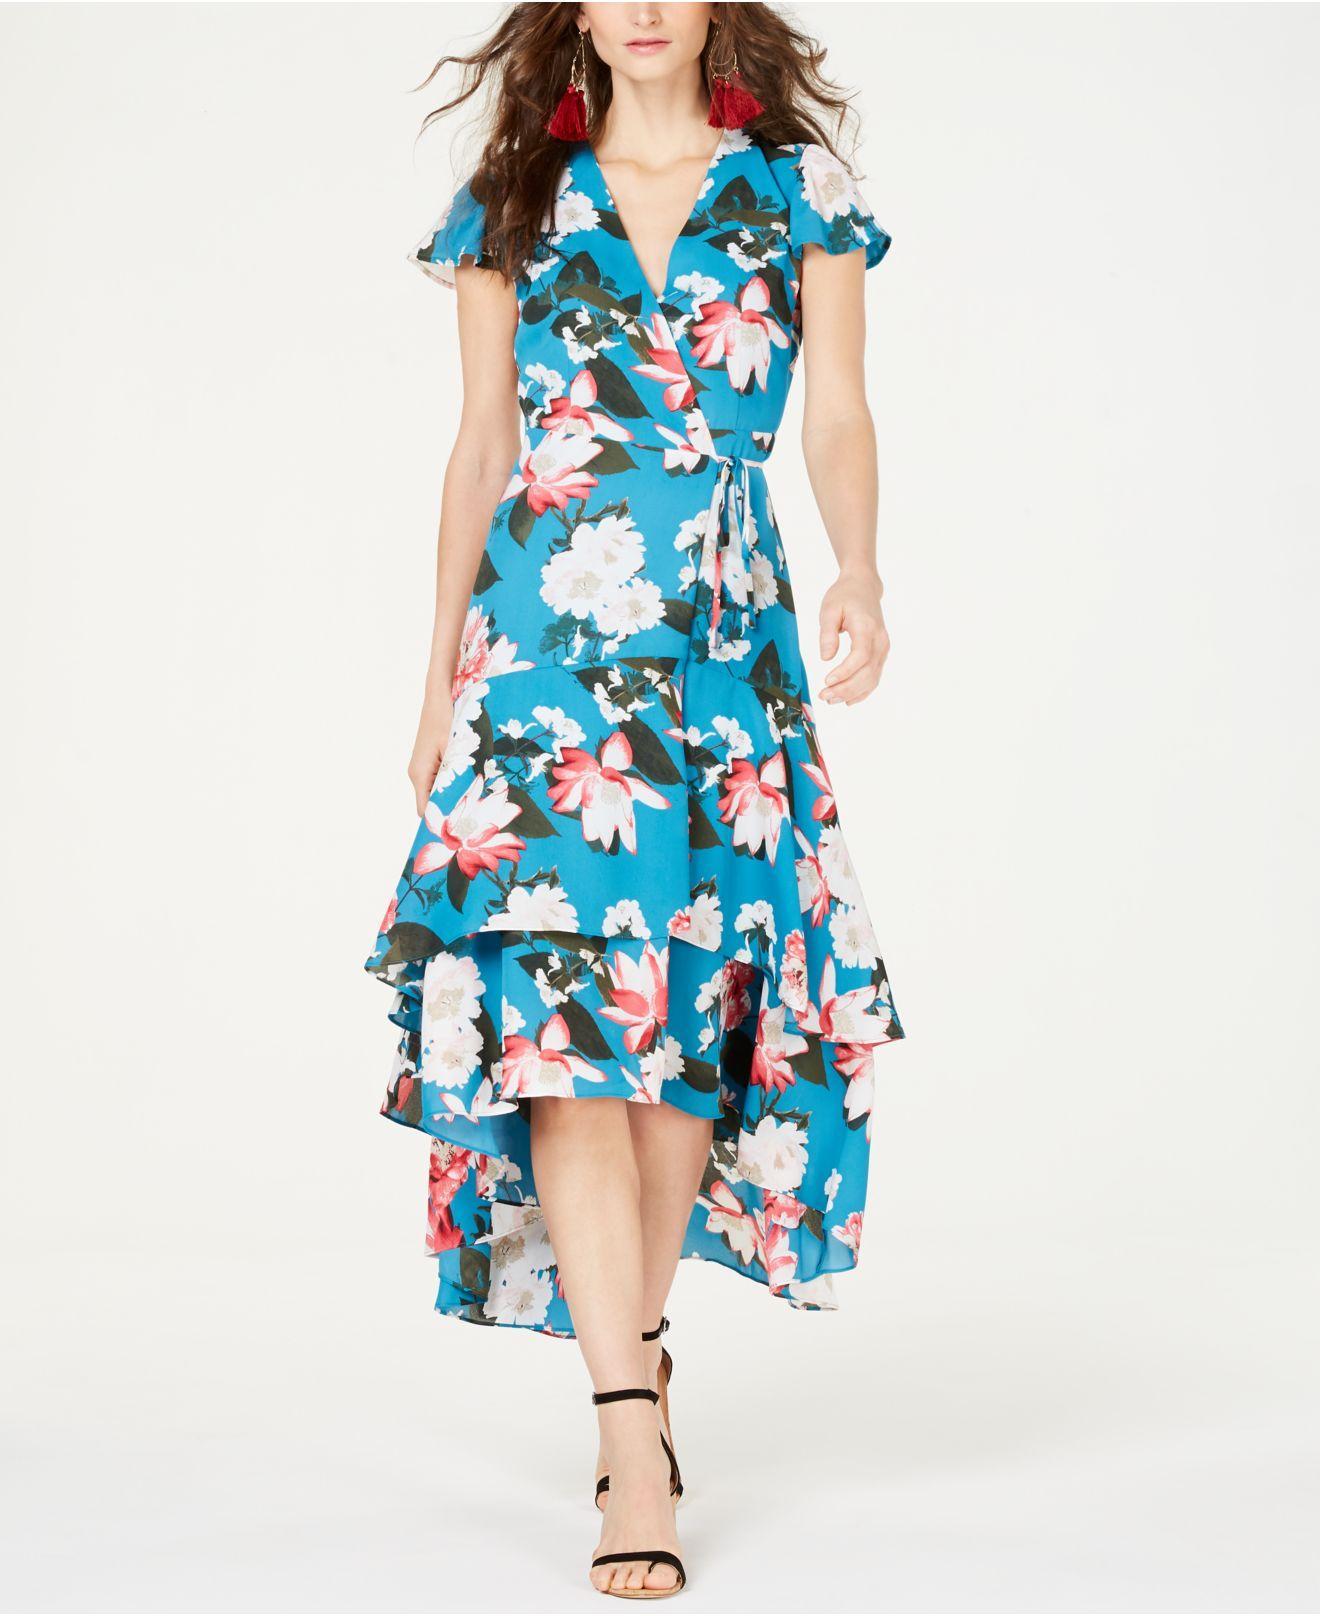 4ac2aece64a Macys Short Floral Dresses - Gomes Weine AG